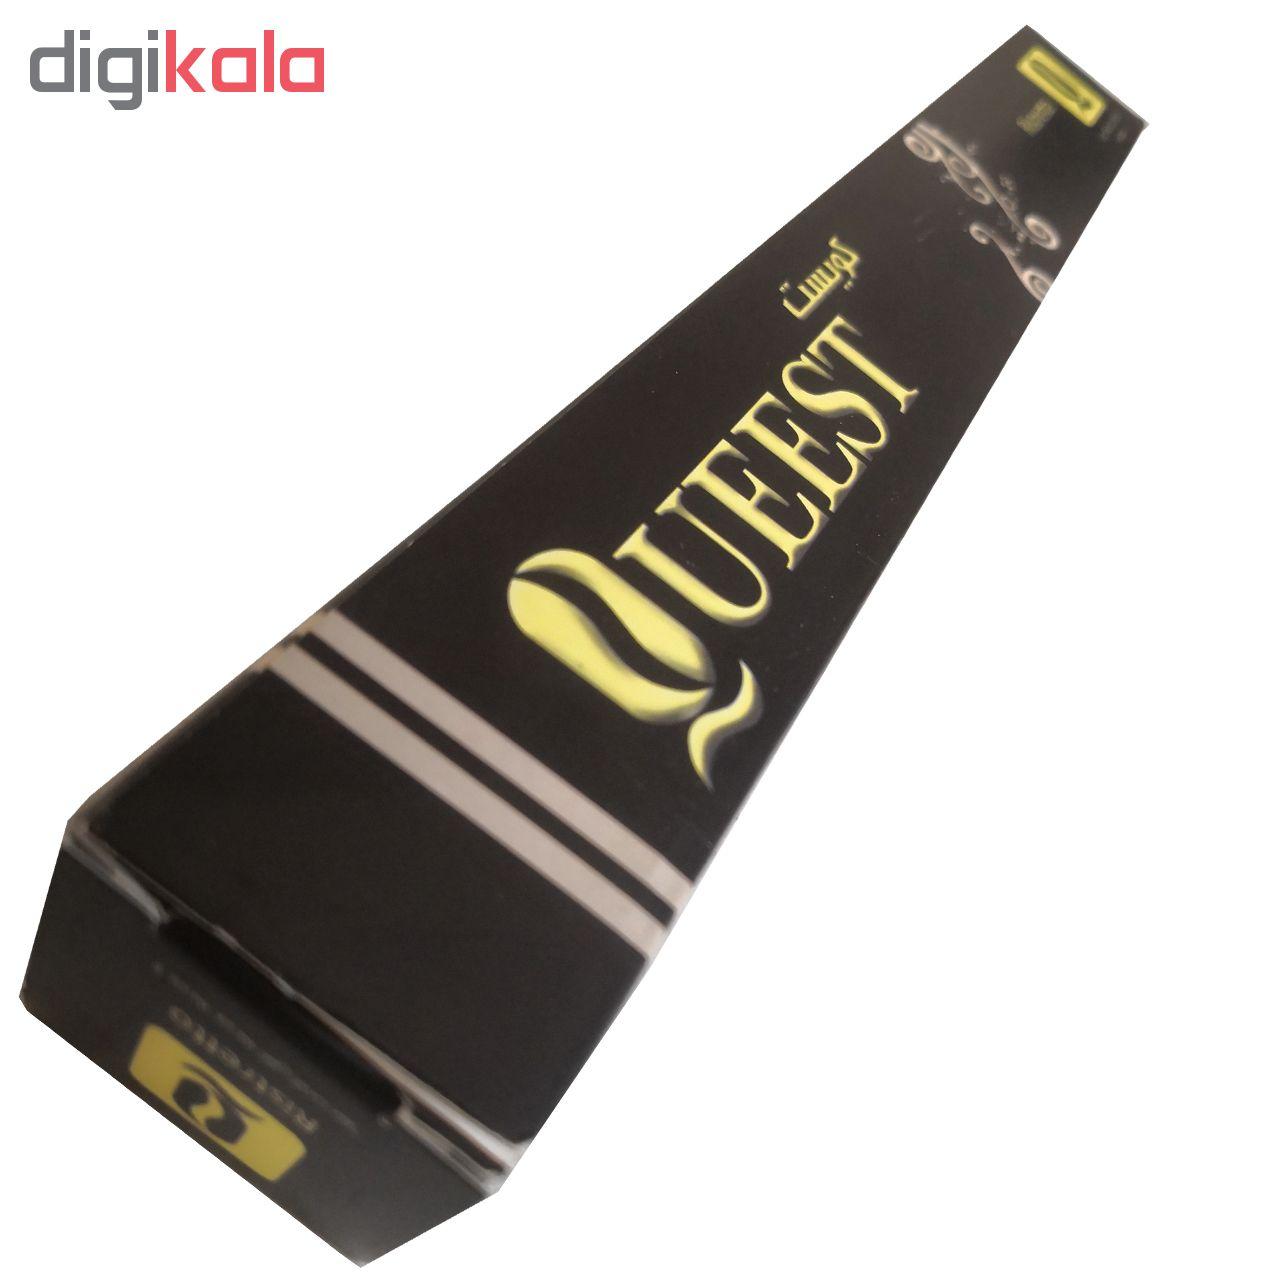 کپسول قهوه دستگاه نسپرسو کوئست مدل Ristretto بسته 10 عددی